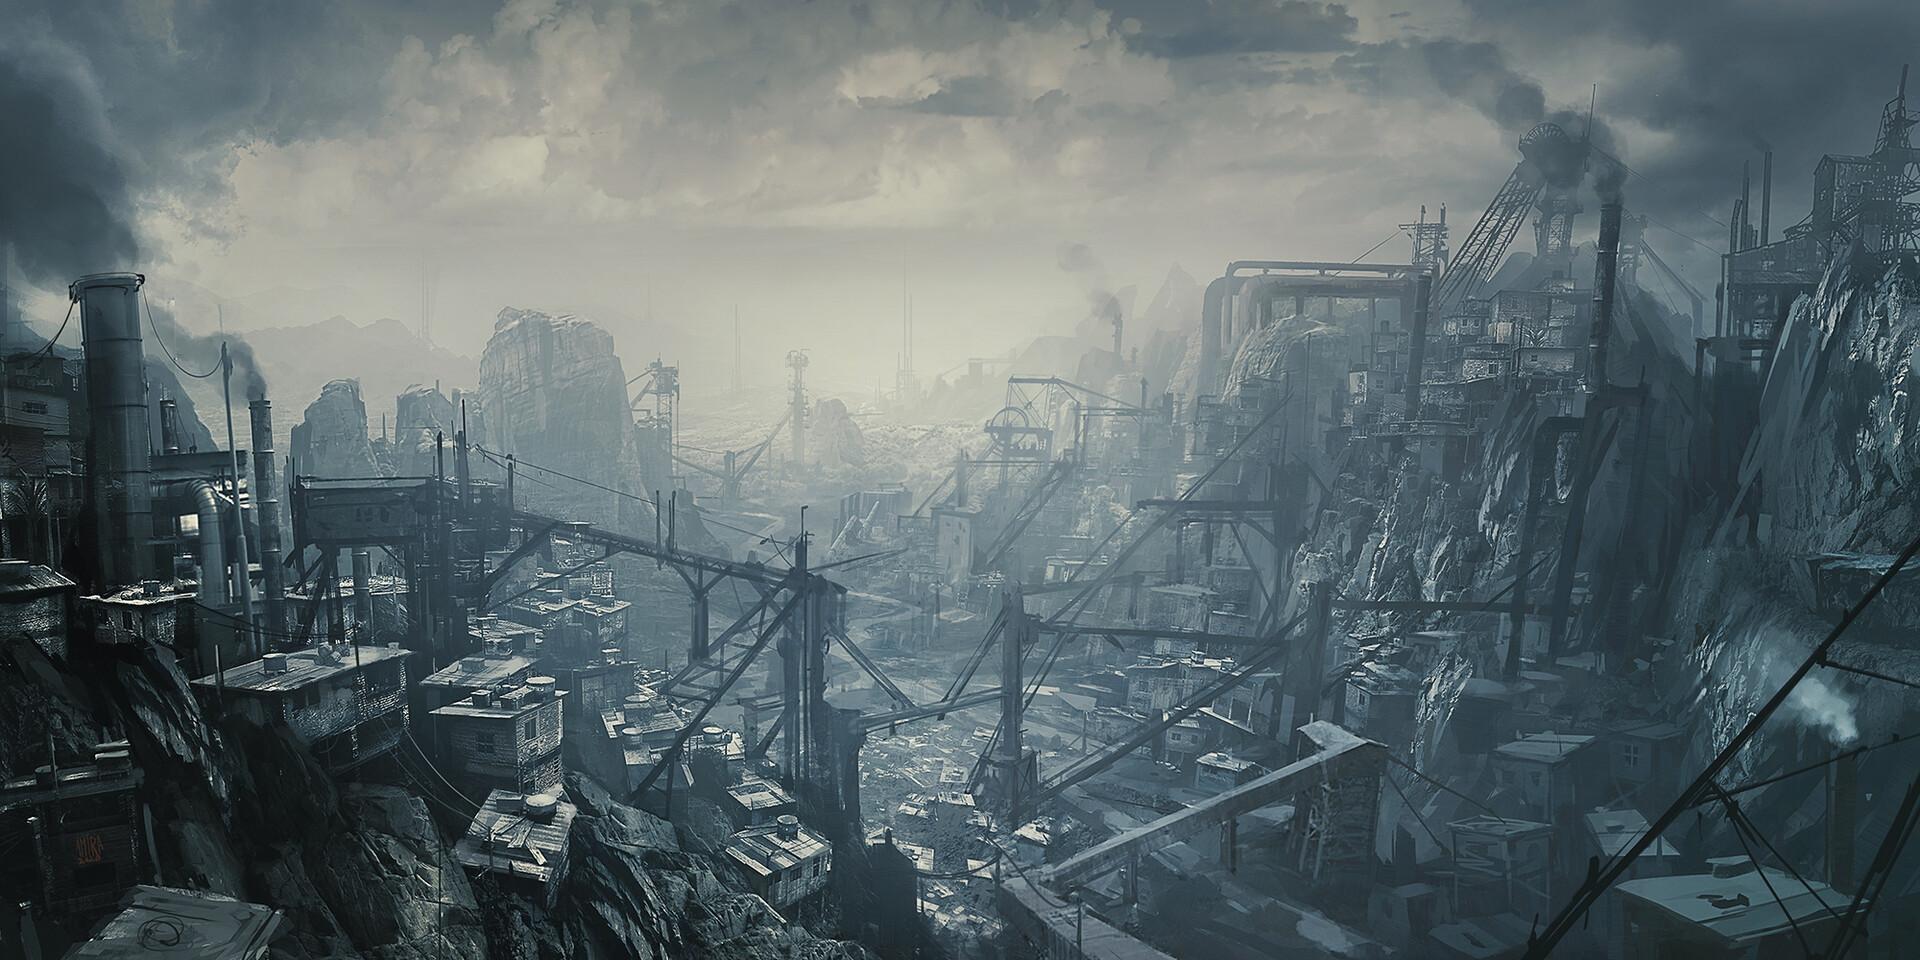 Post-Apocalyptic slums